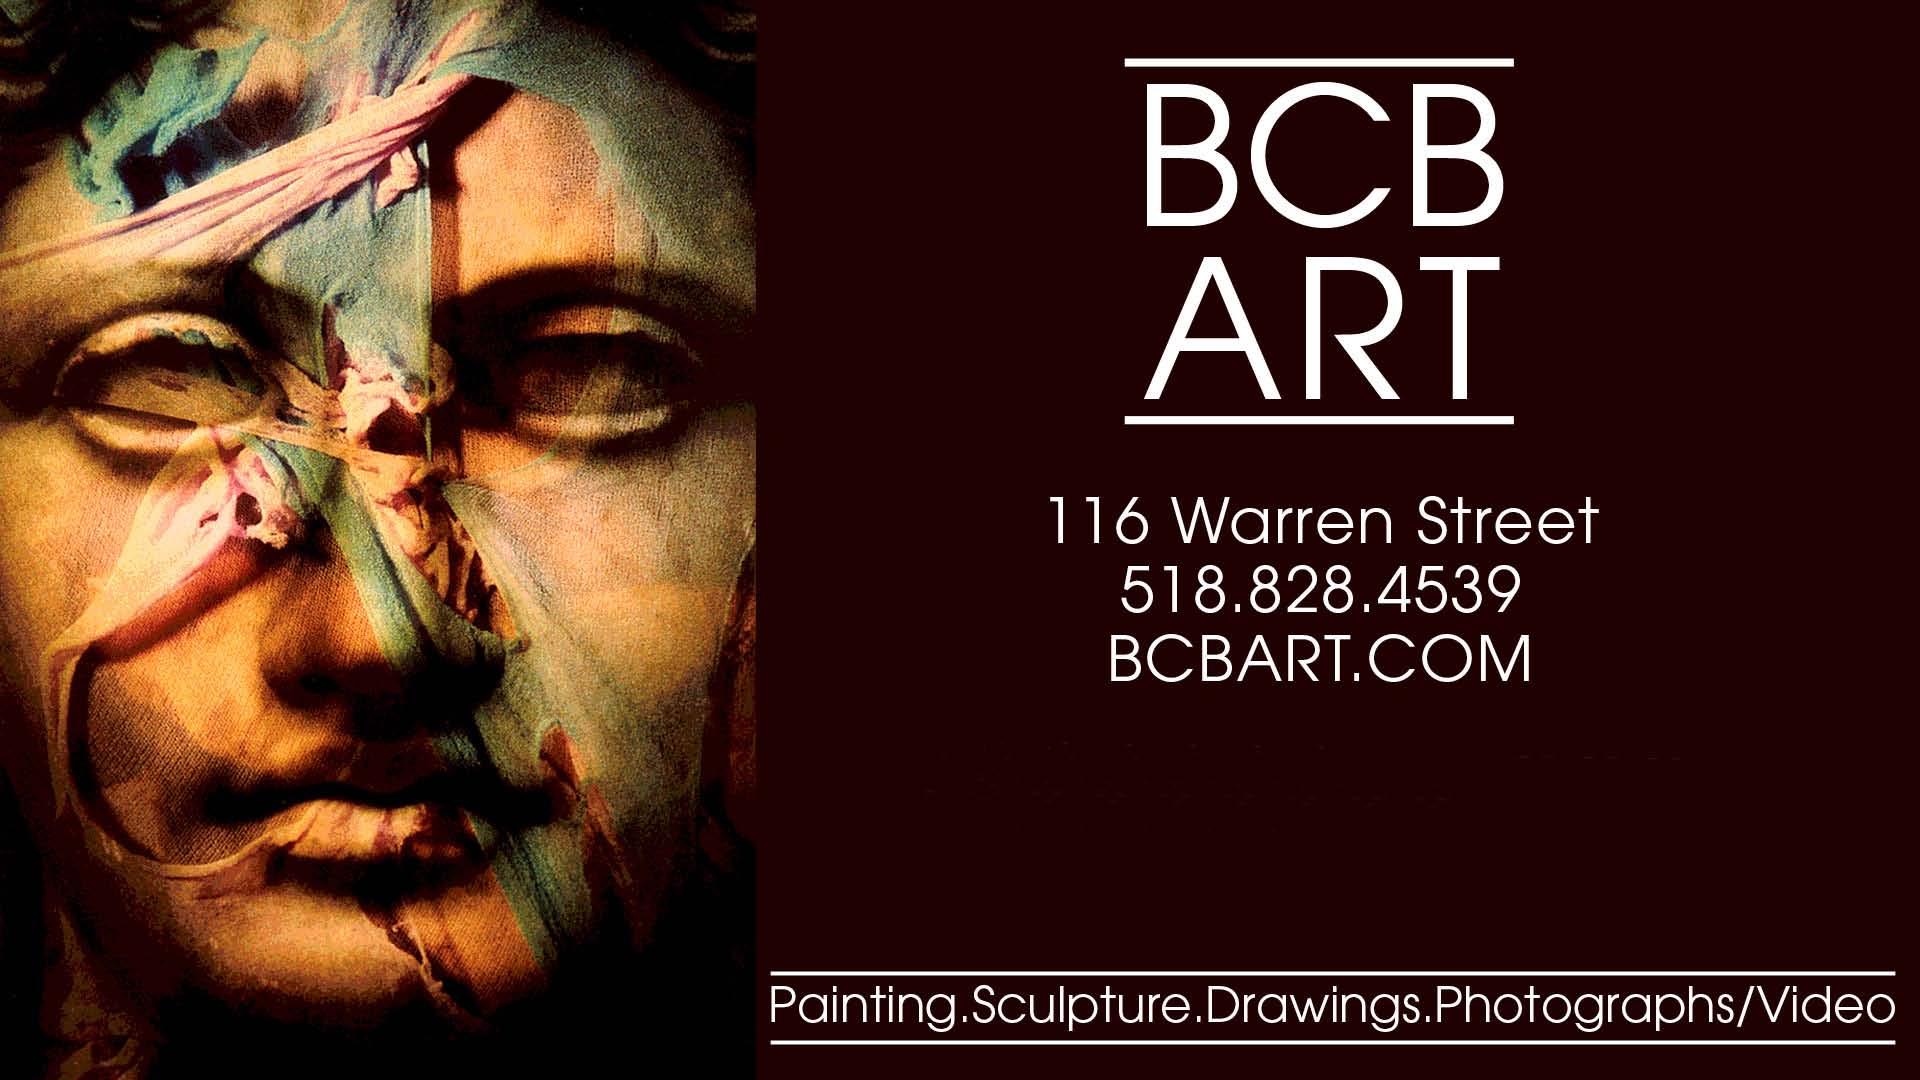 BCB_ART_Home